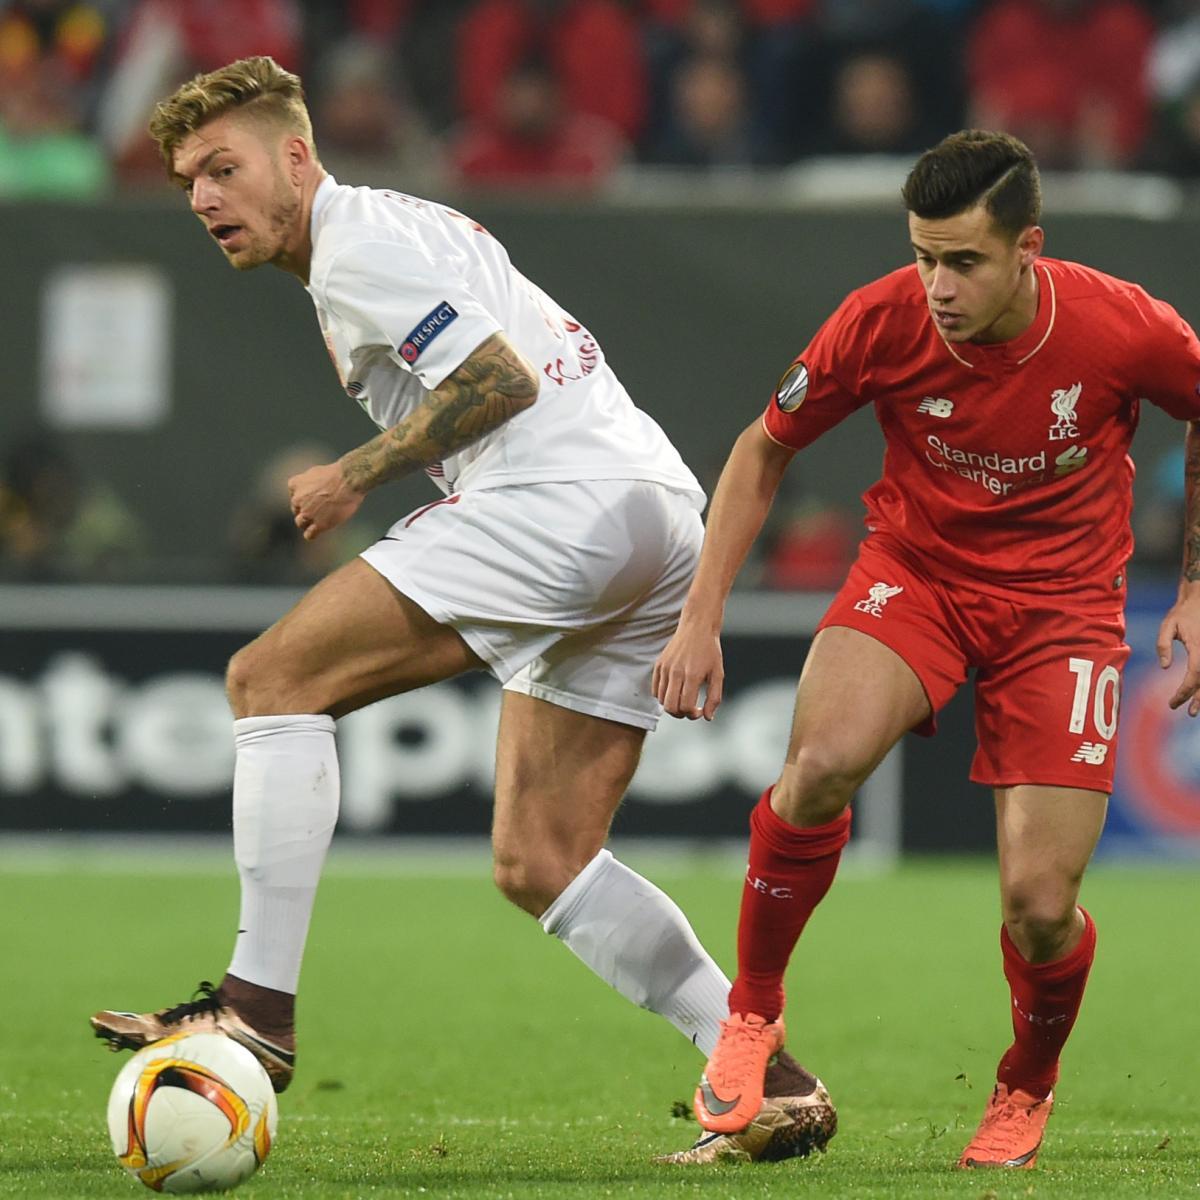 Liverpool Augsburg Live